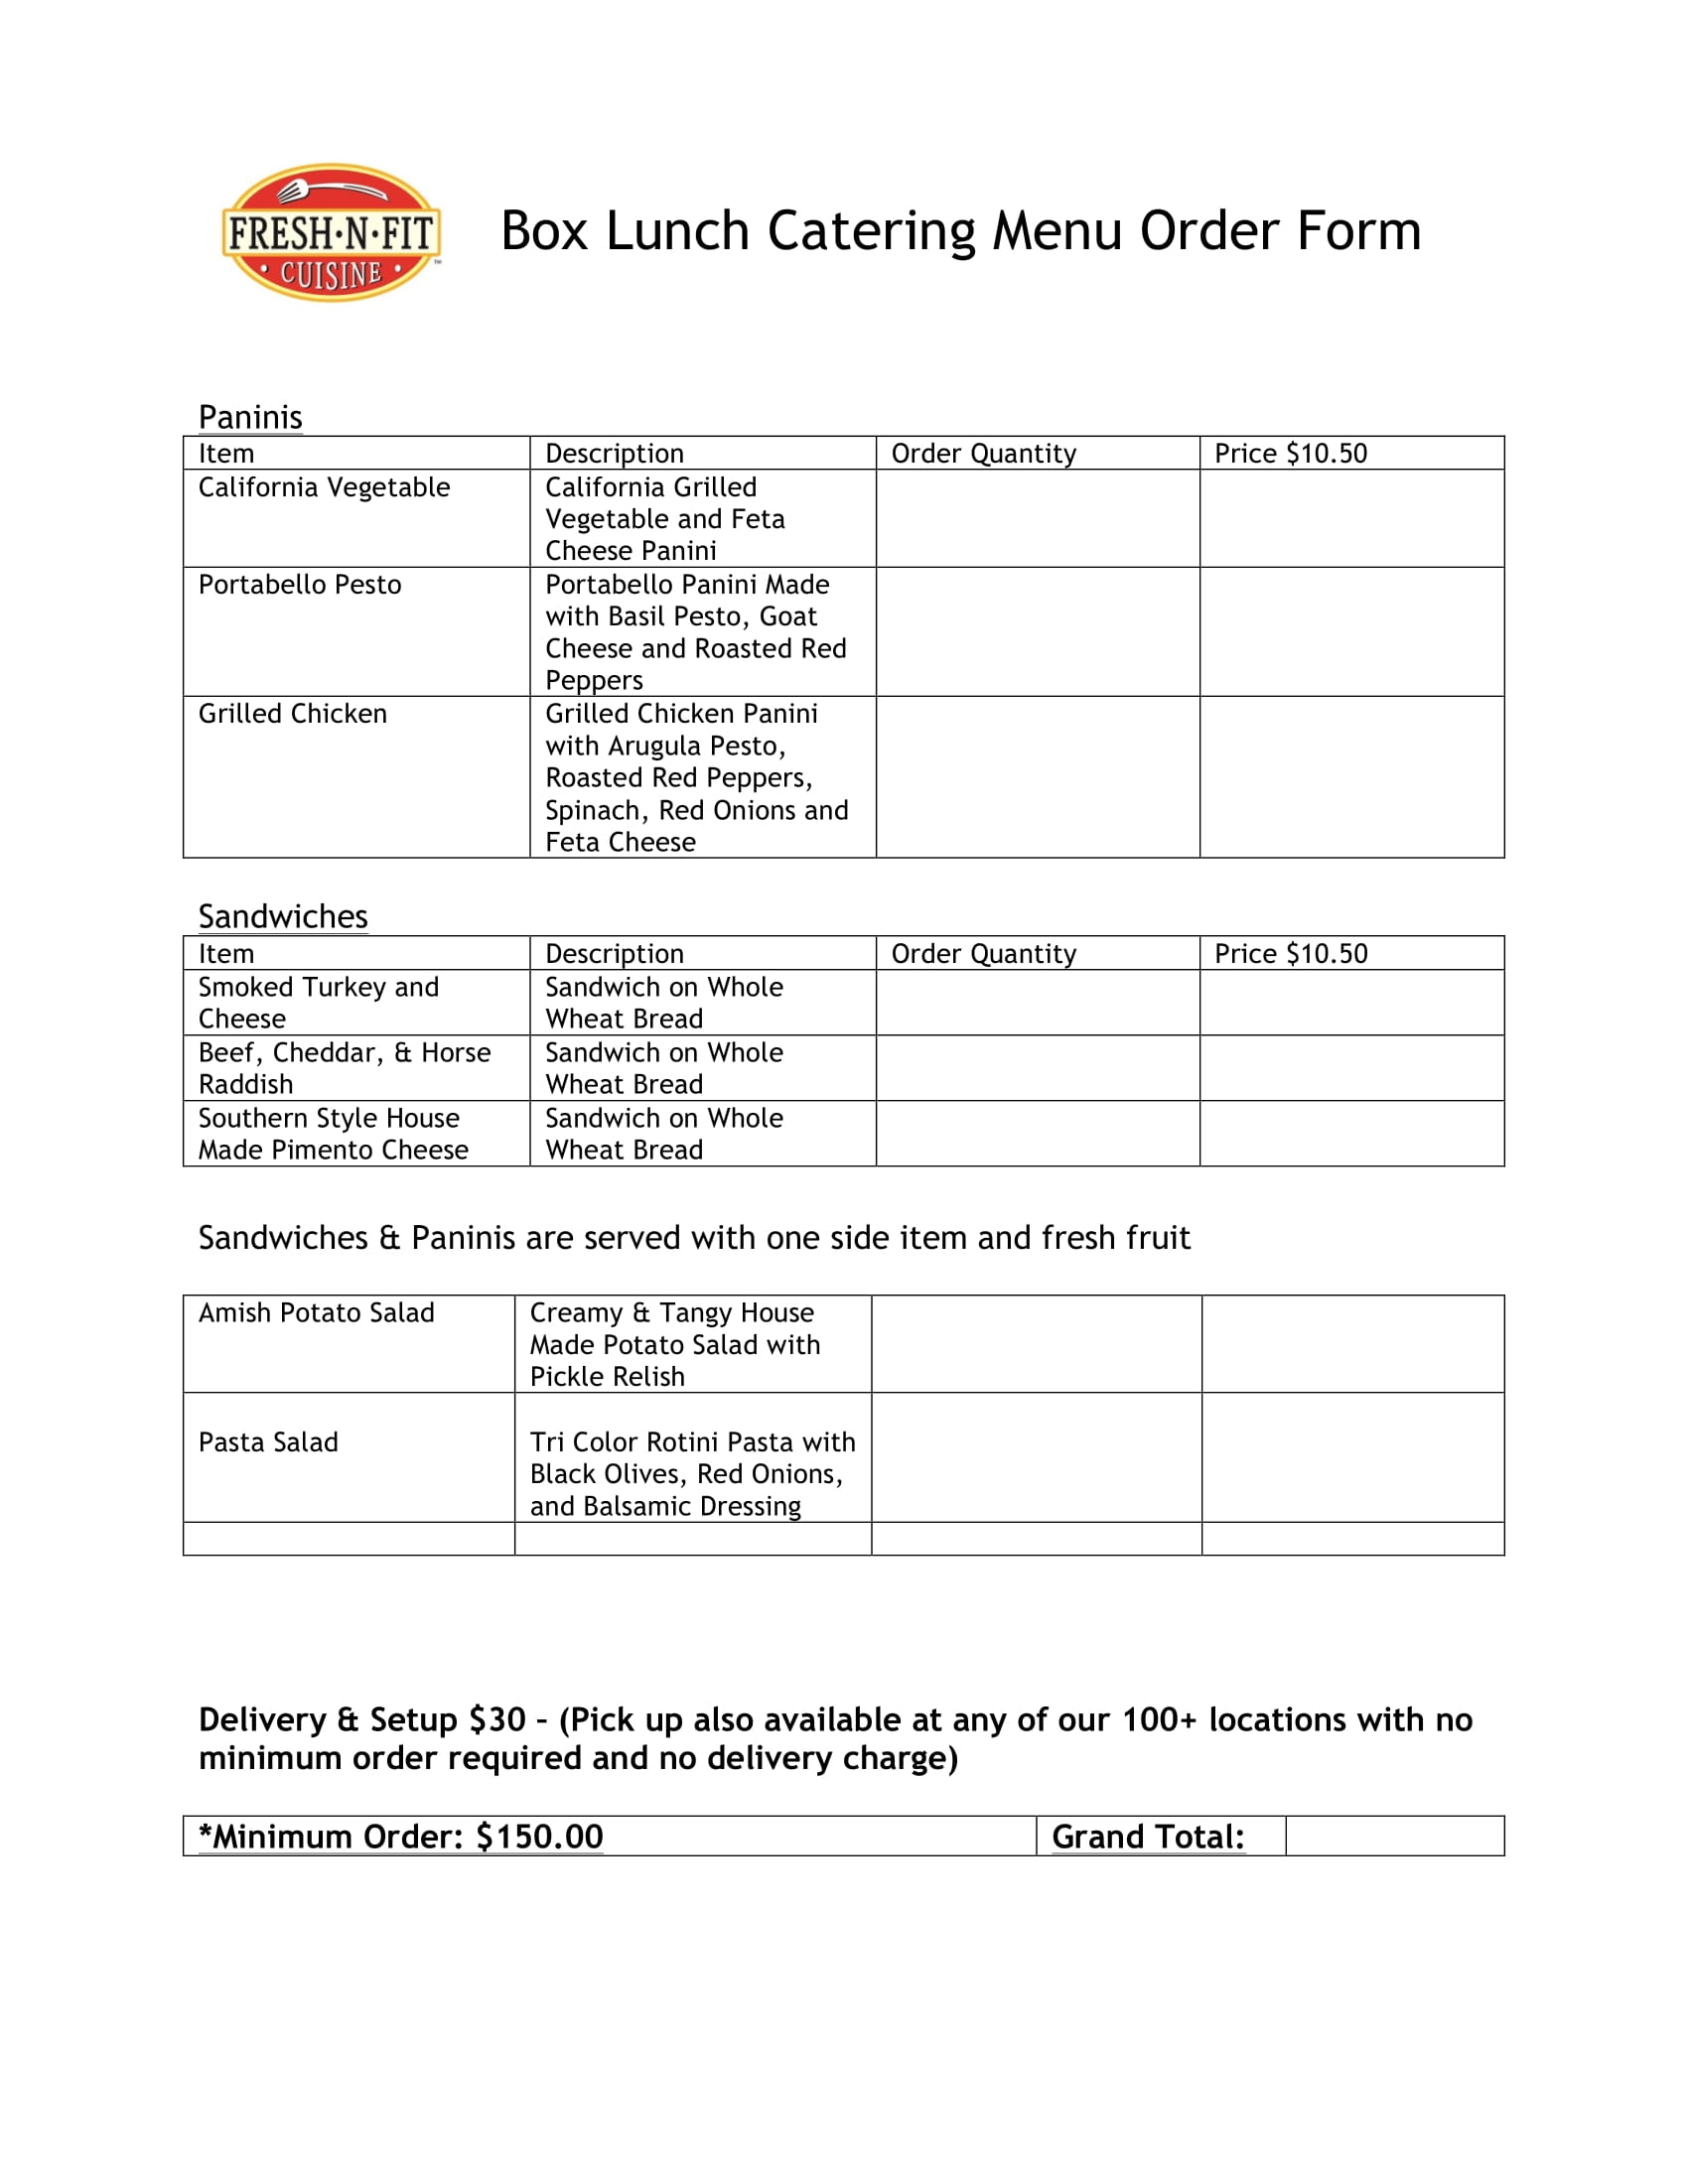 catering menu order form 1